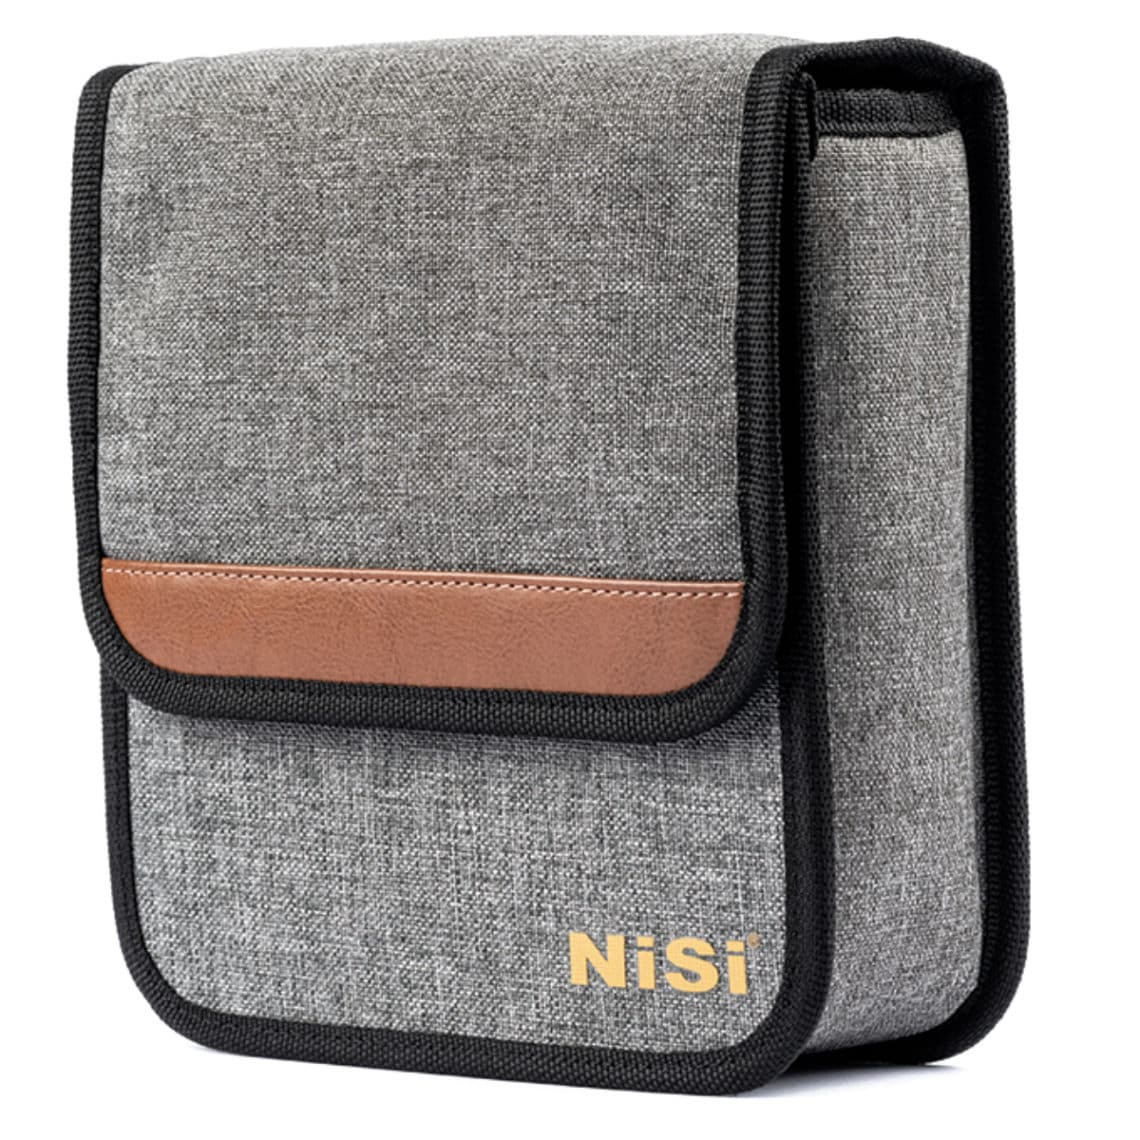 NiSi S6 Holder | Polariser PRO | Sony 12-24 f 2.8